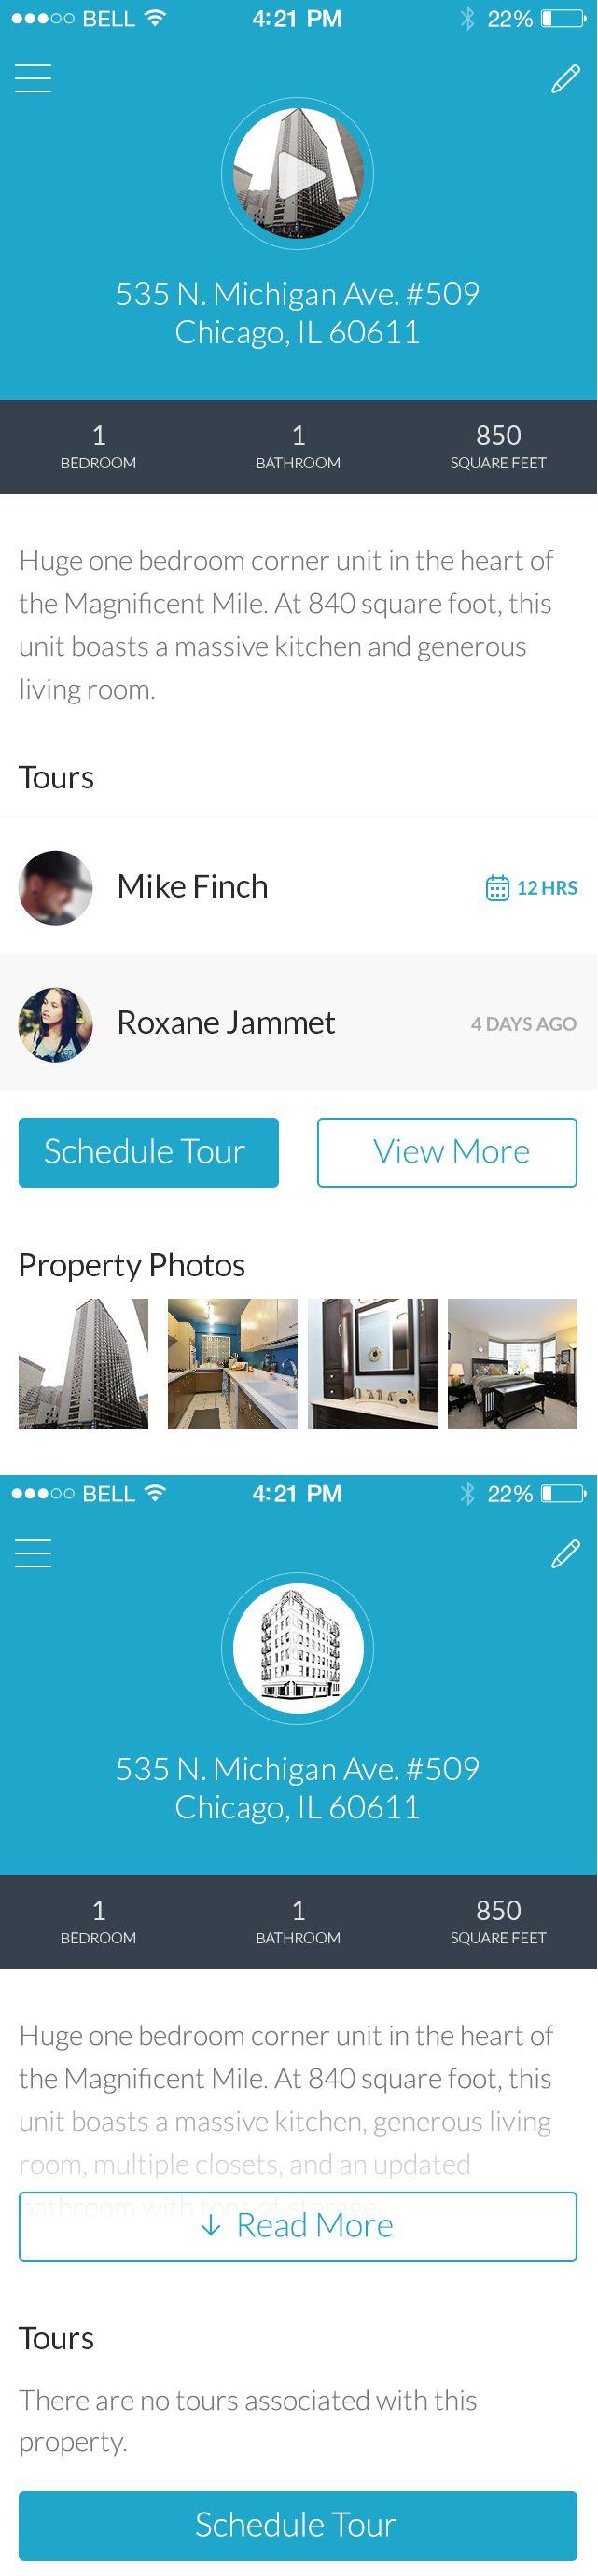 87 best 투명UI images on Pinterest | Google glass, User interface ...